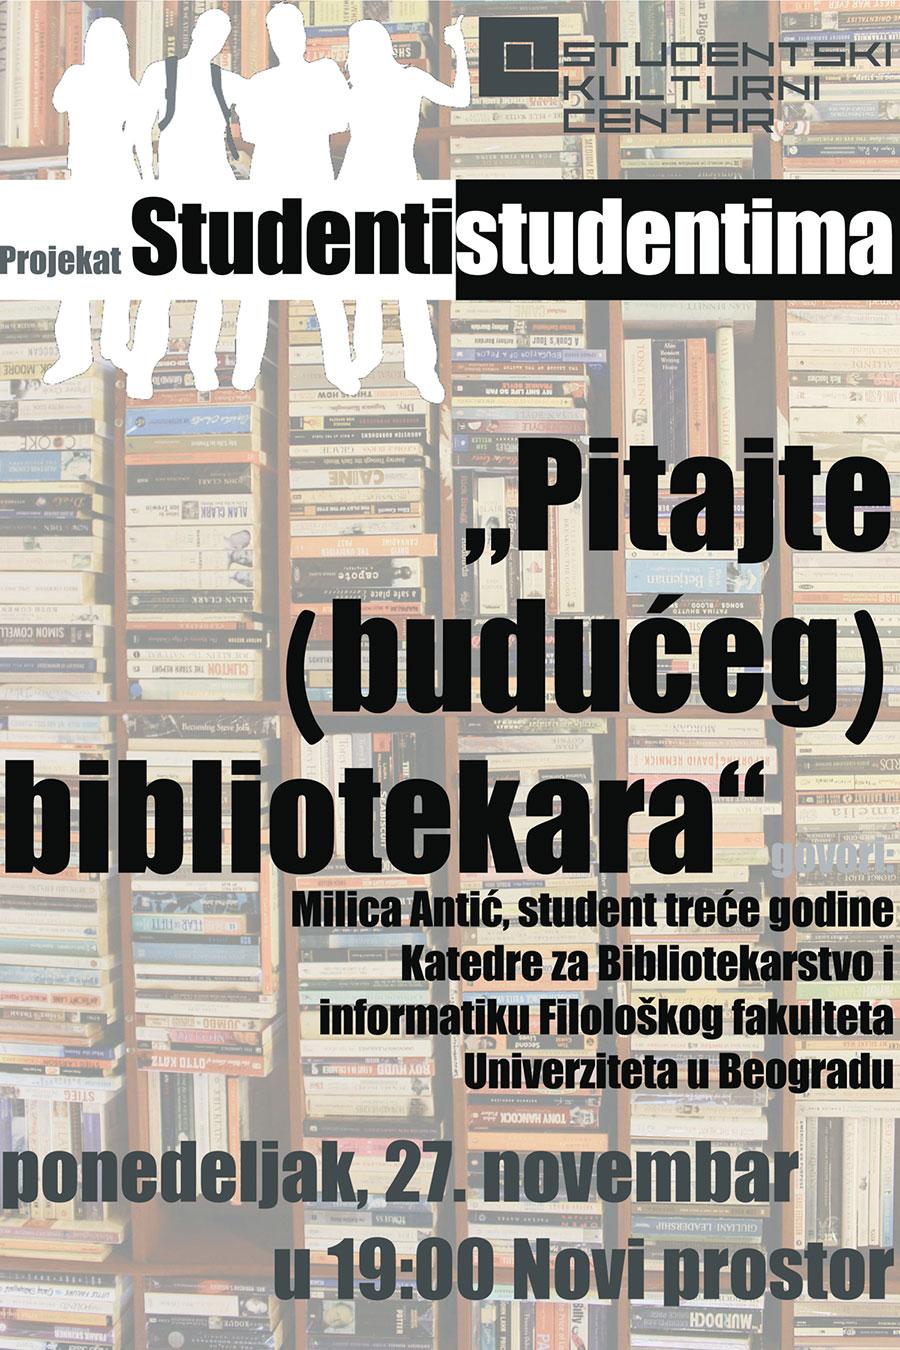 2017_Pitajte_buduceg_bibliotekara_main